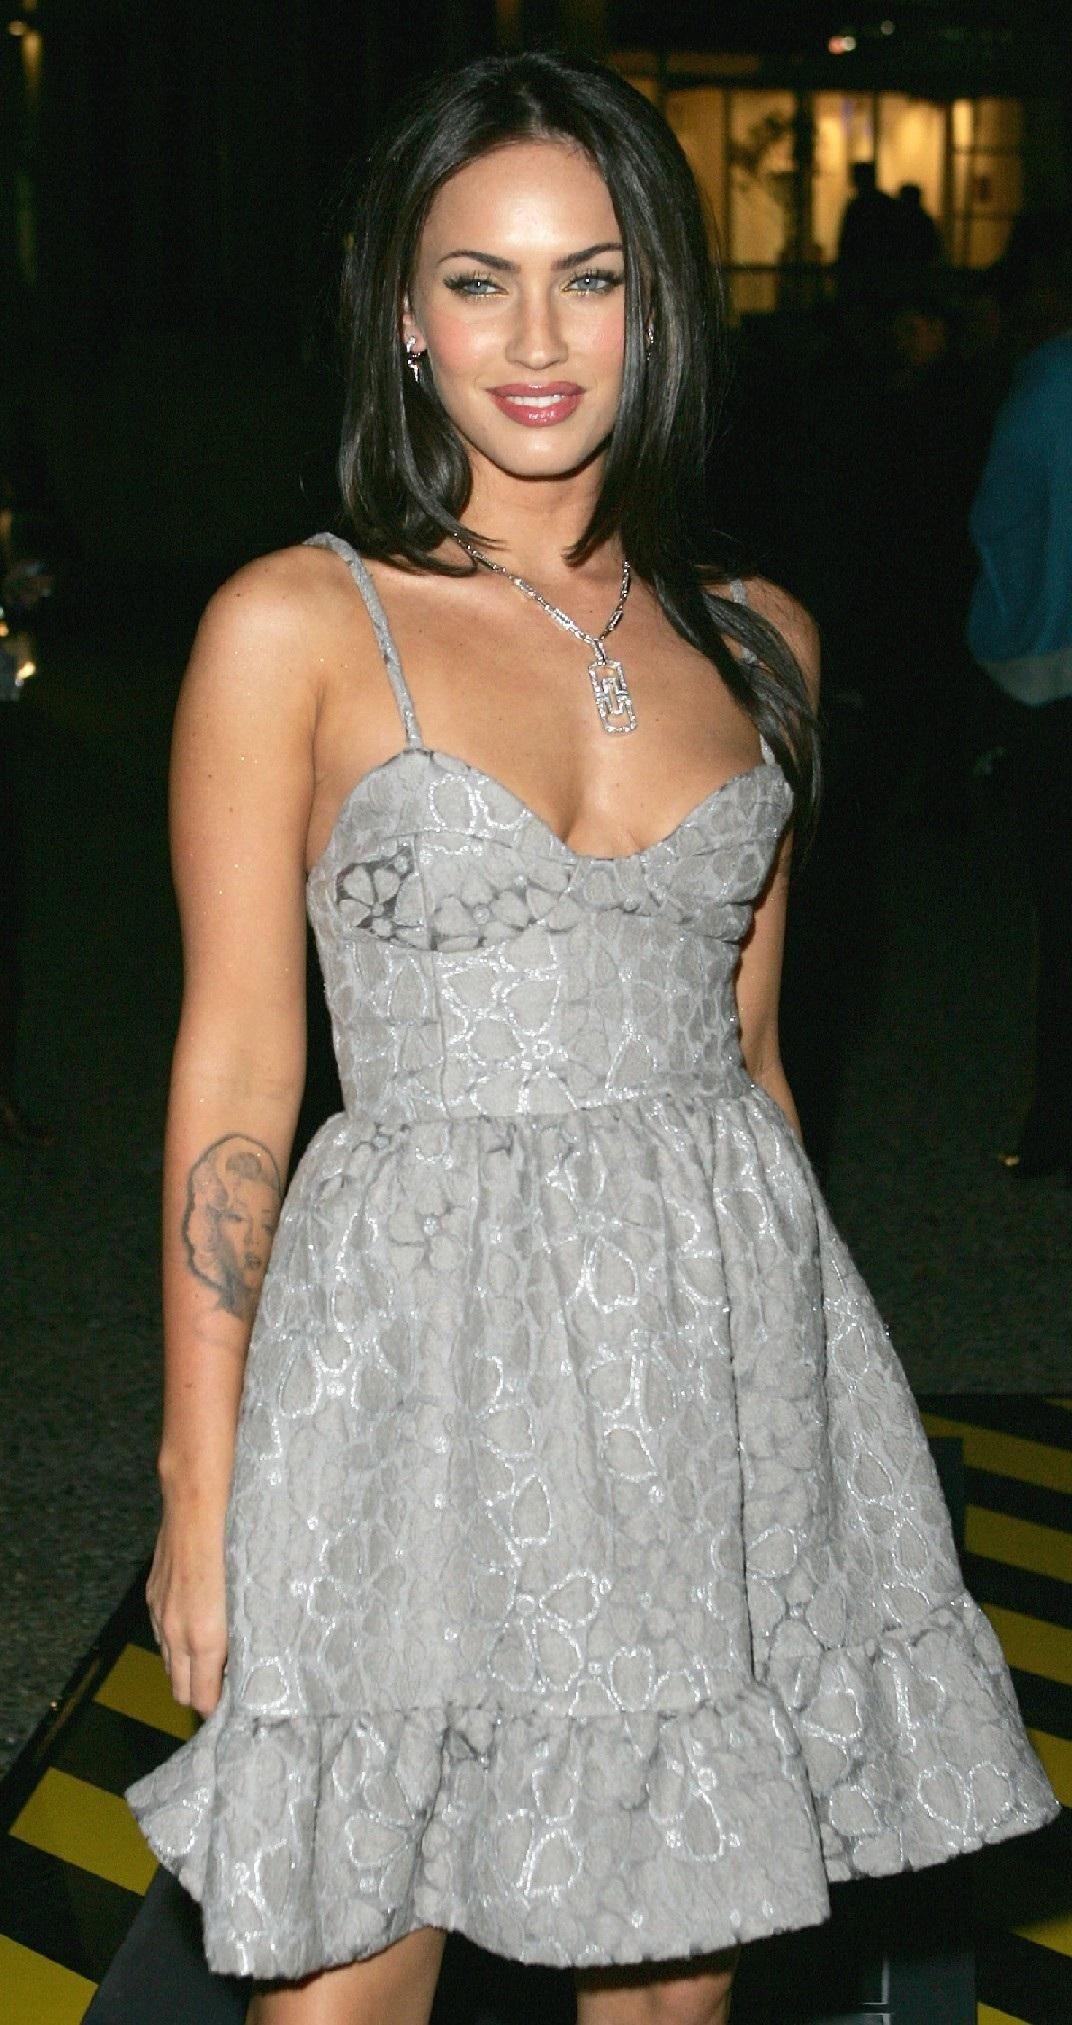 ae7e8dad9 Megan Fox Grey Dress Transformersaustraliapremiere | ❤MEGAN FOX ...